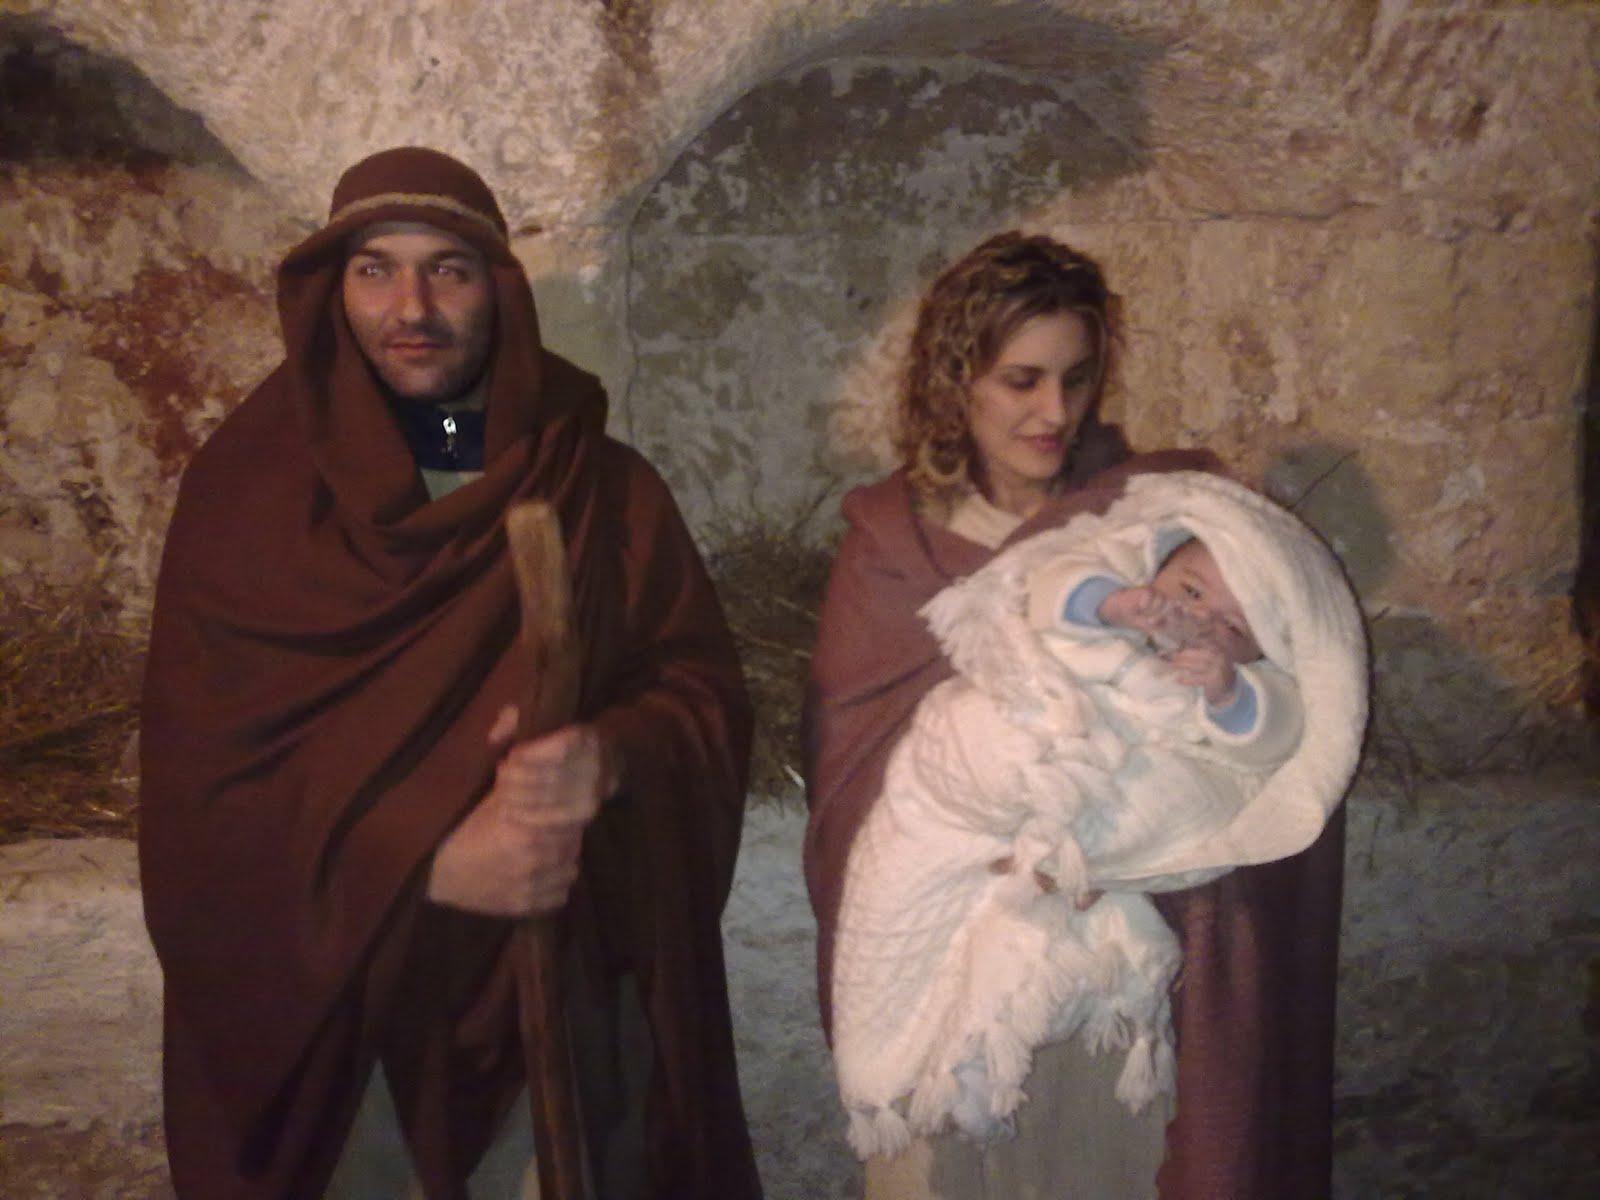 Giuseppe spenga natale 2011 fotofilm - Specchia presepe vivente ...